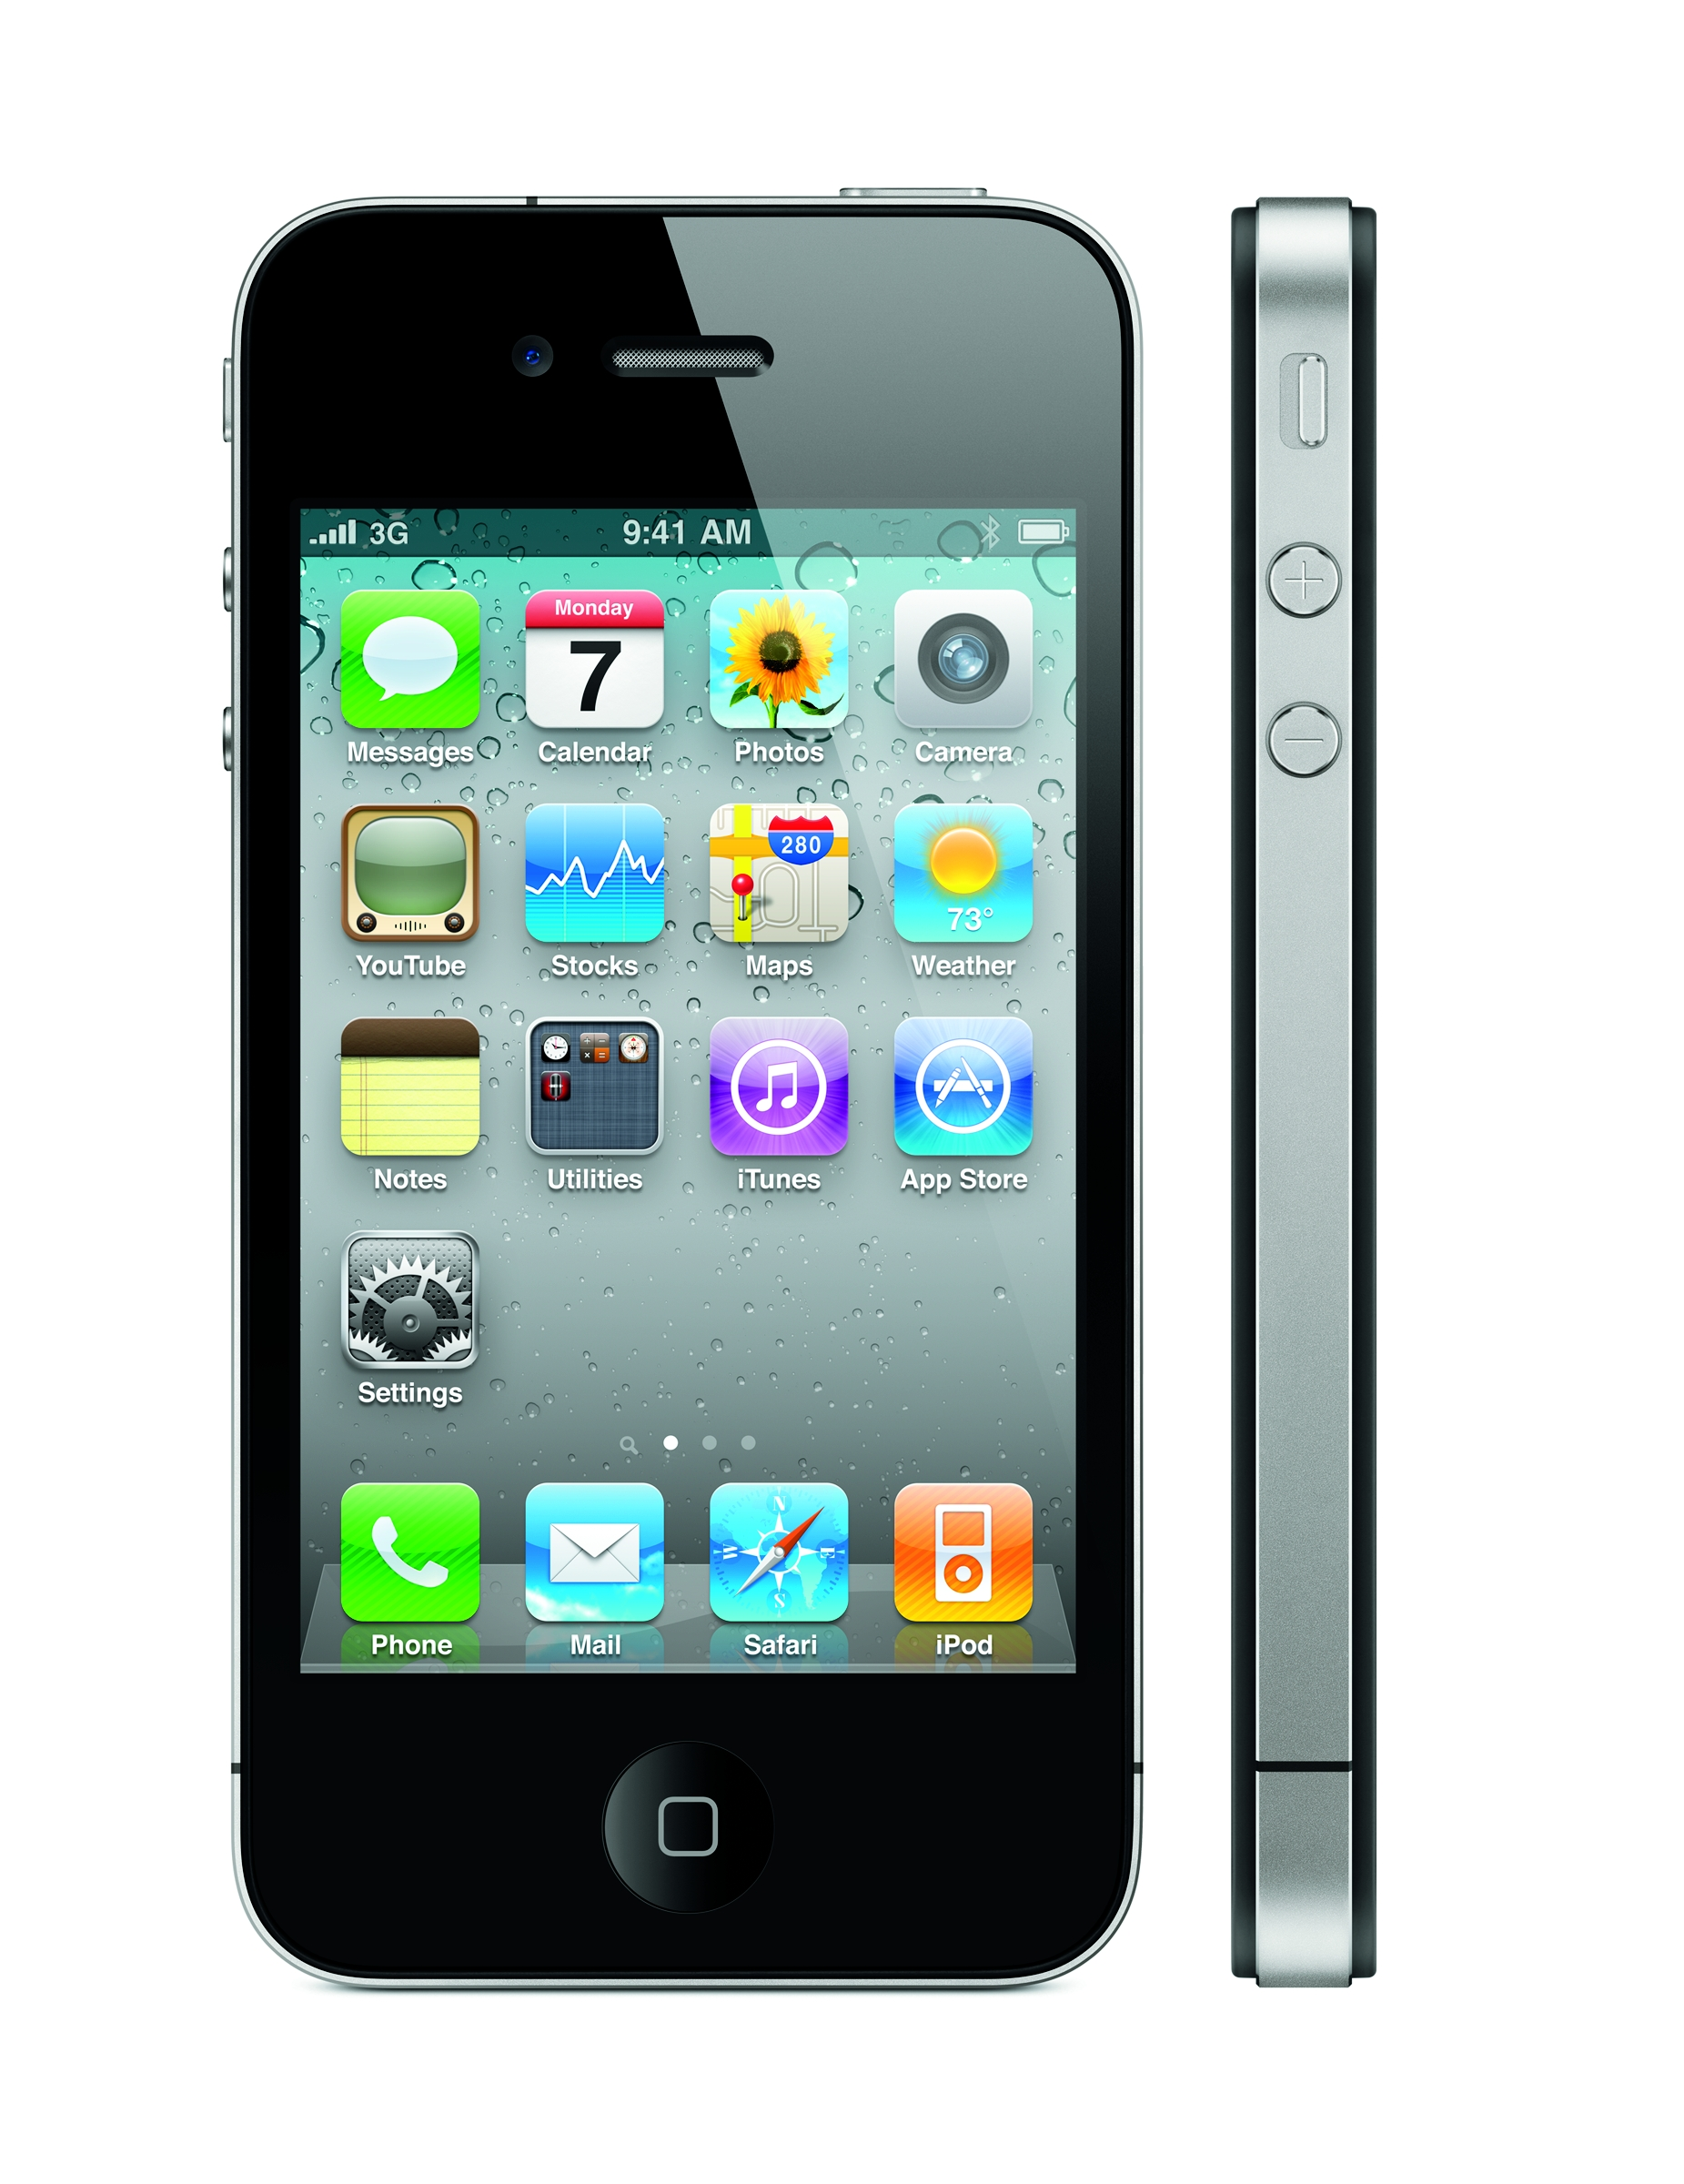 iphone 4 info amp video � el mundo tech